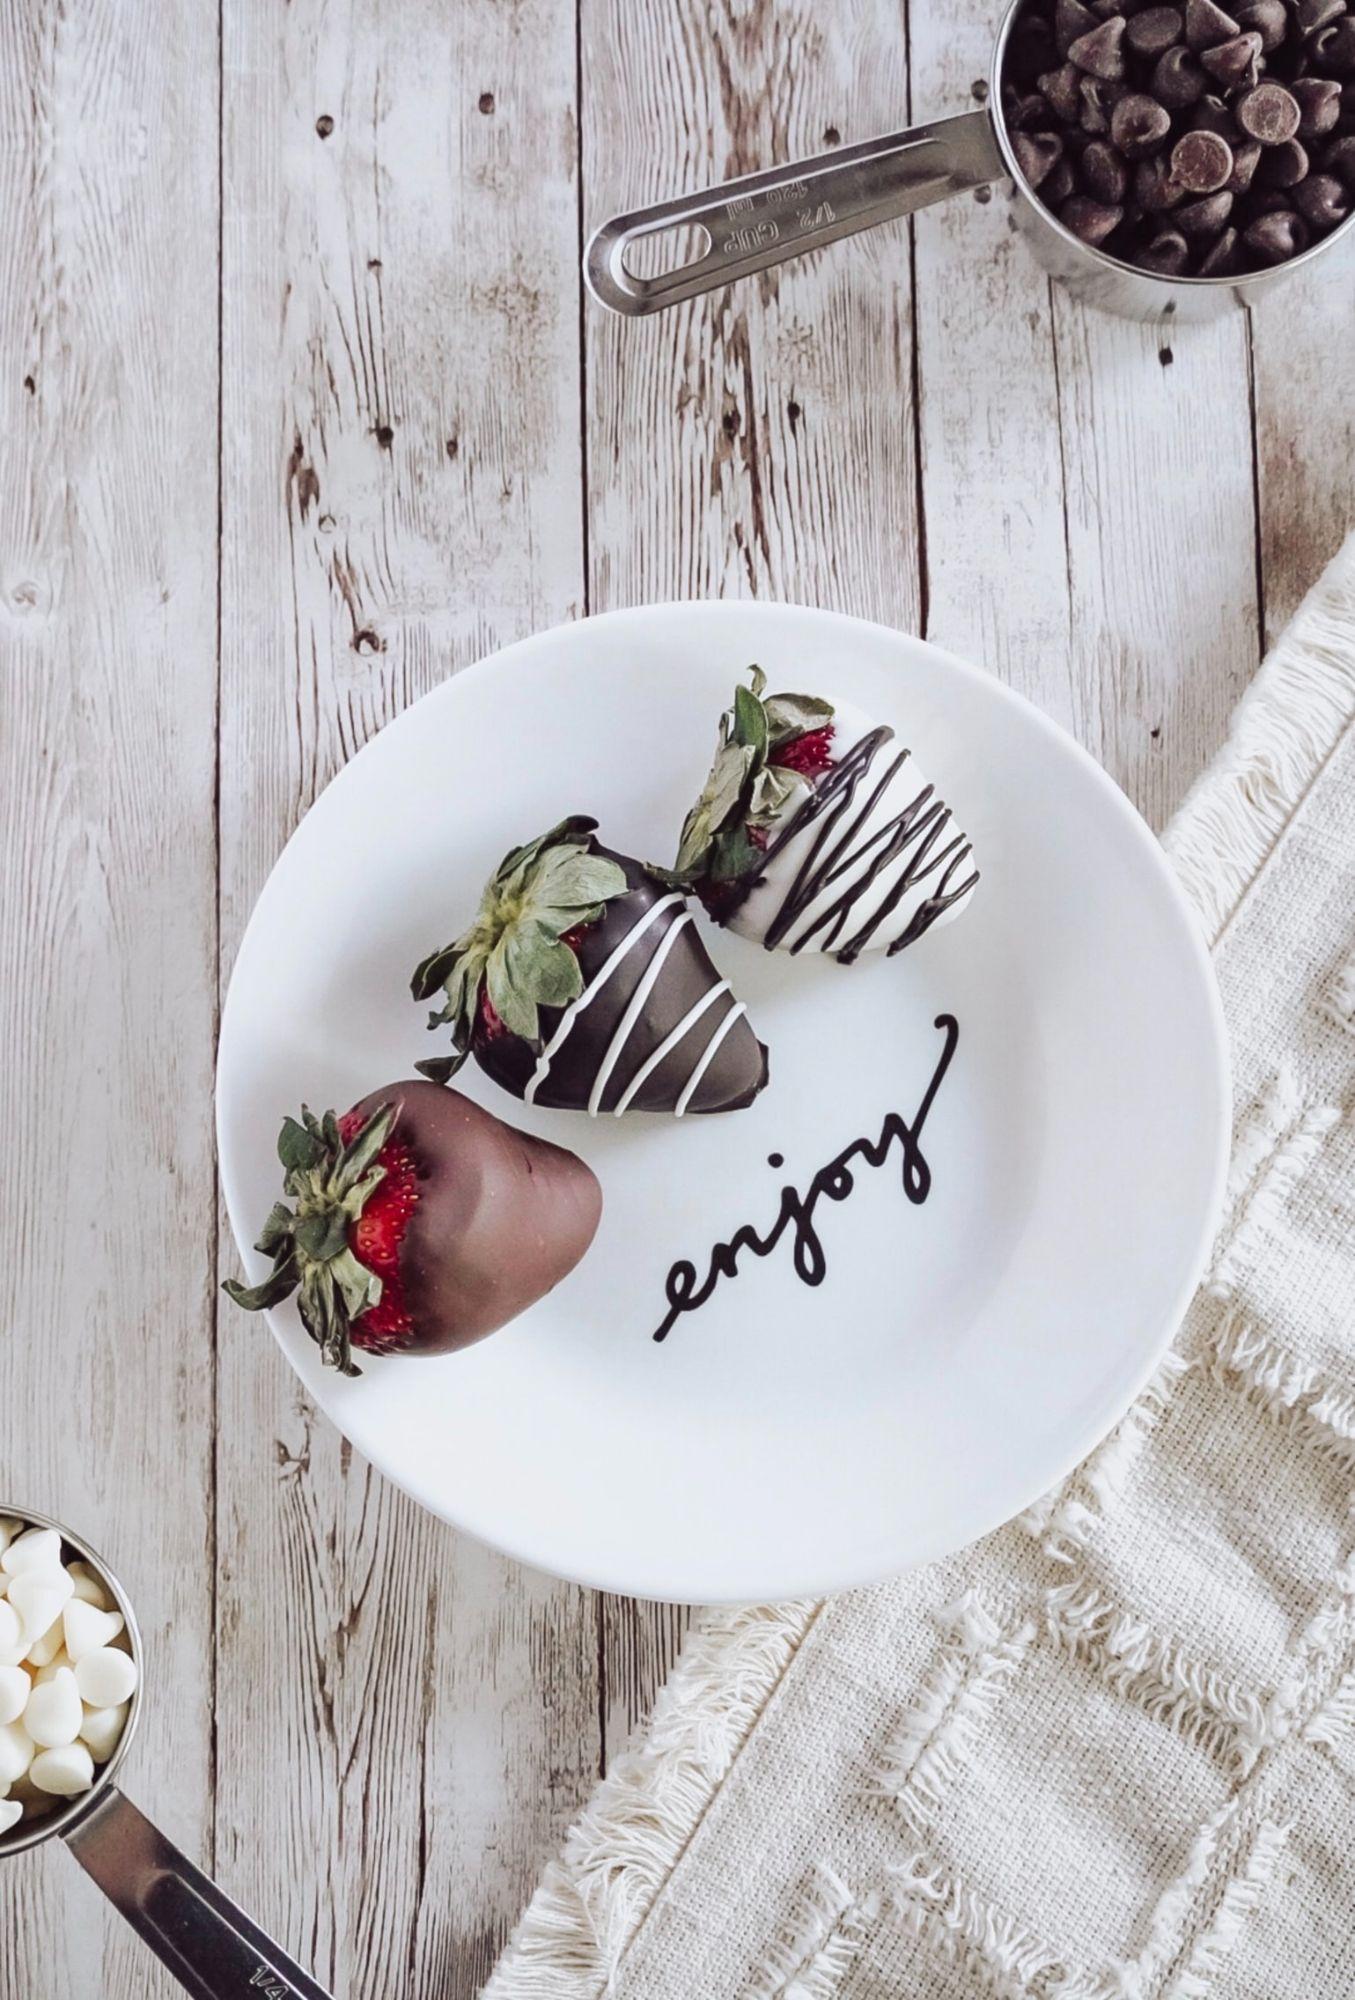 Perfect Chocolate Coated Strawberries